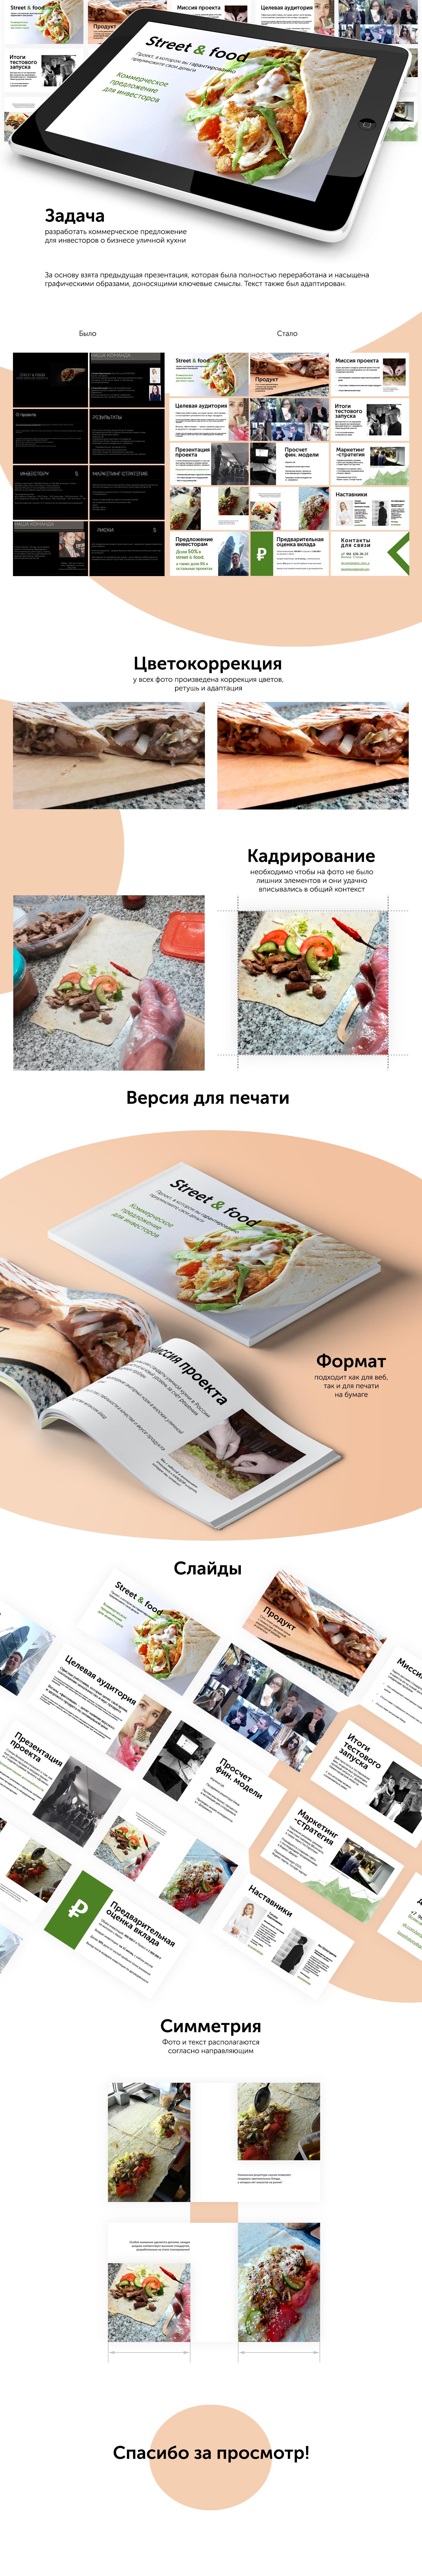 «Street & food» – КП для инвесторов